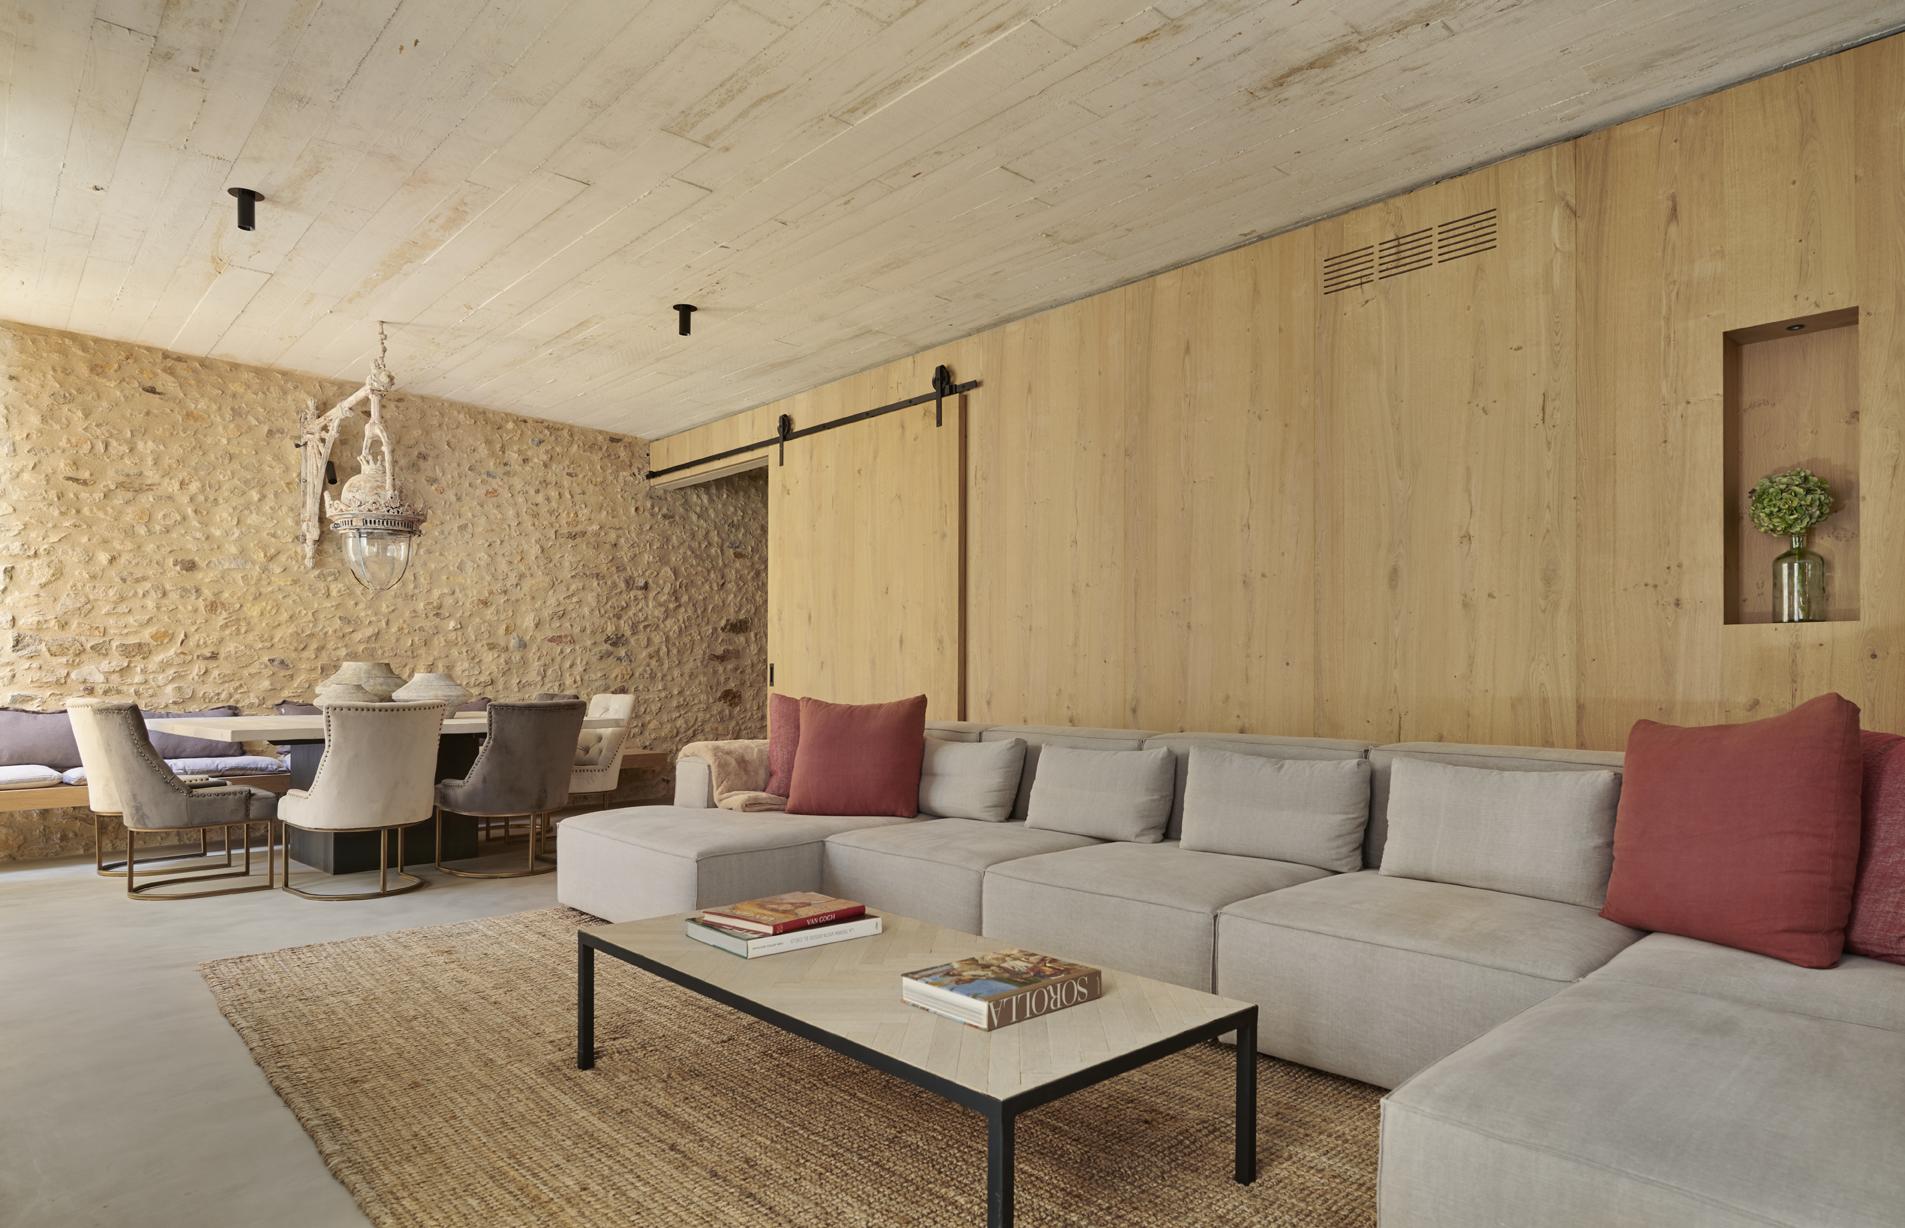 Sala de estar / TRONC3